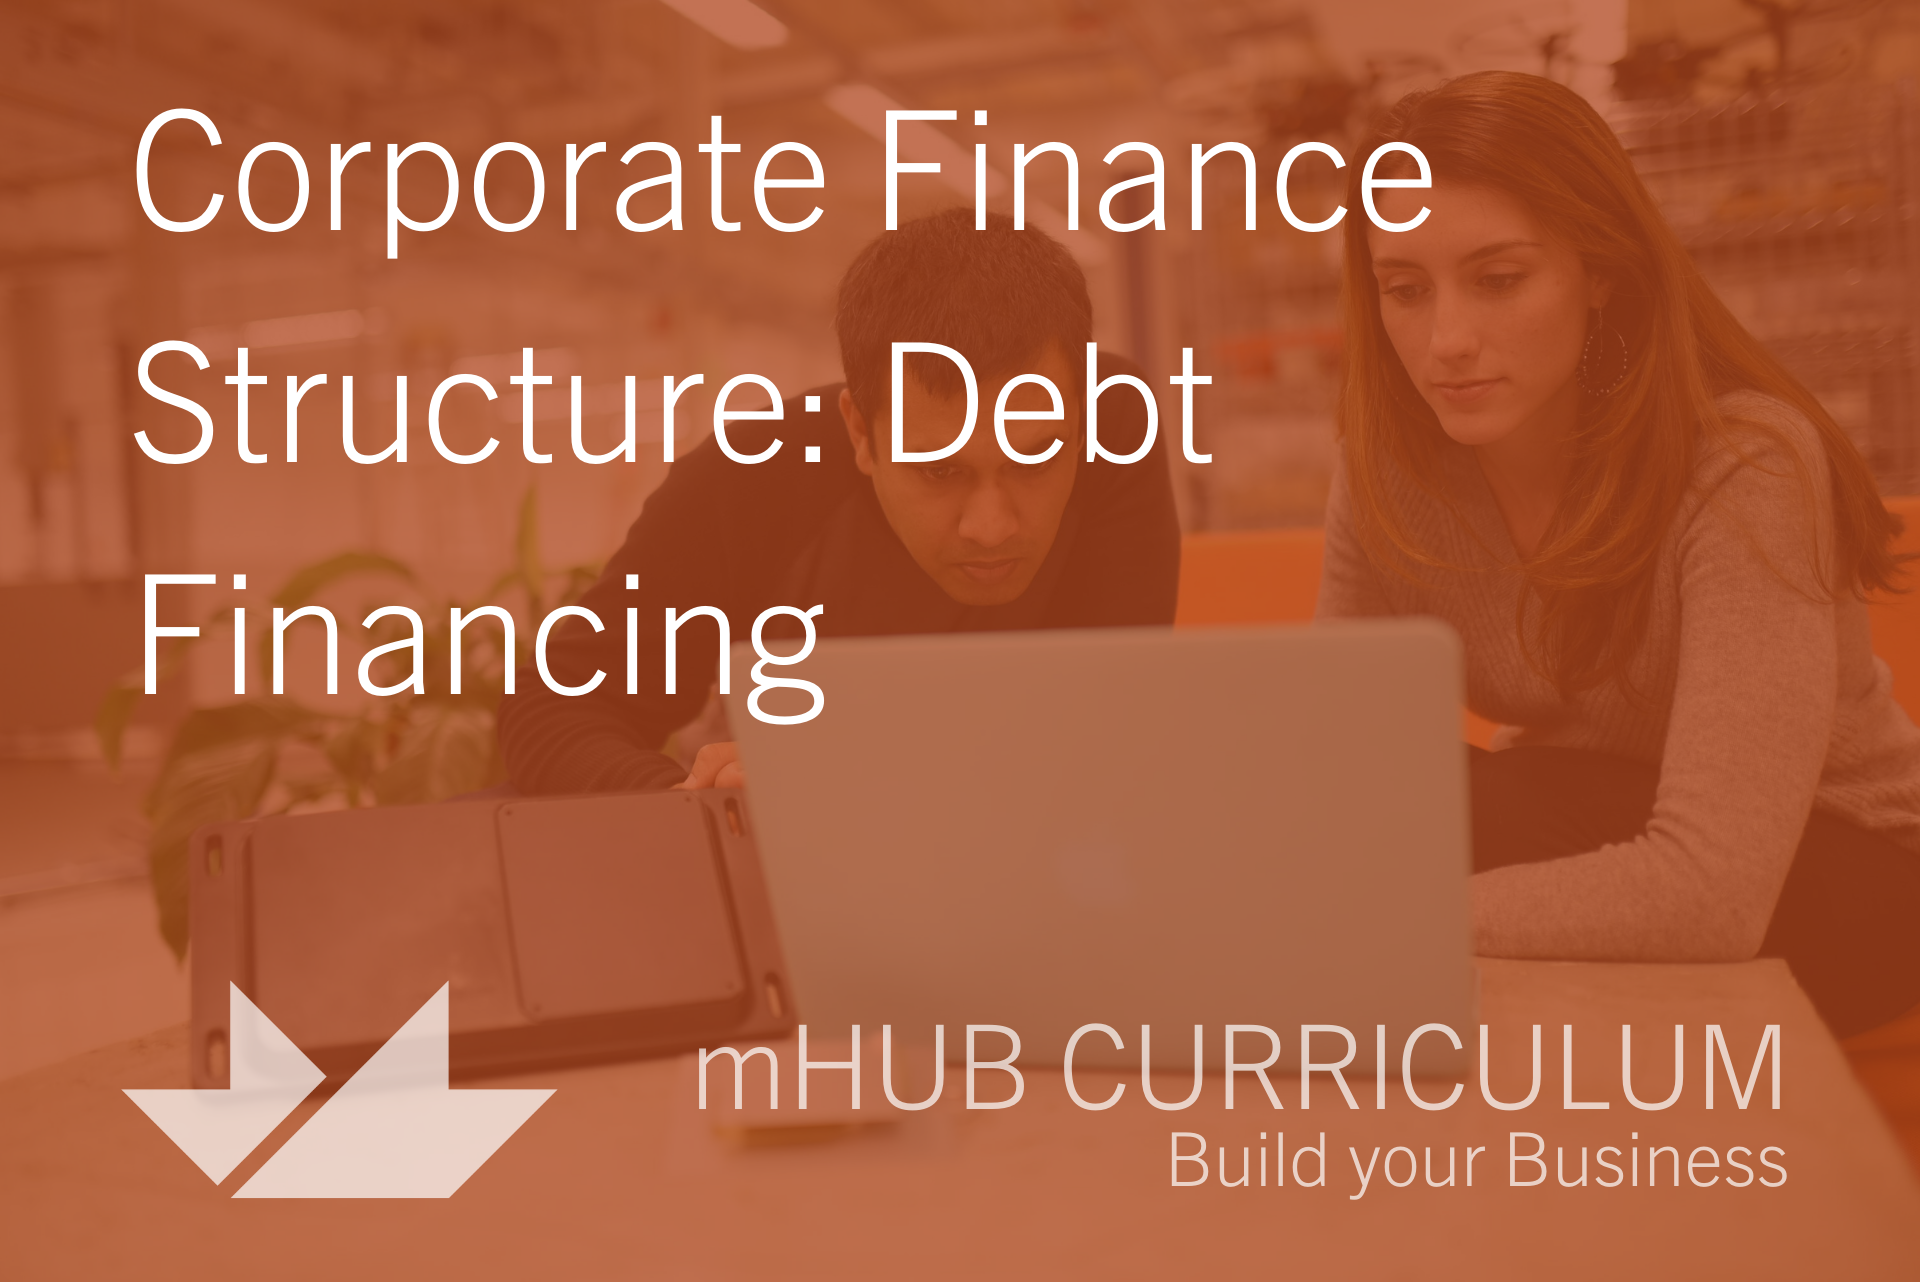 Corporate Finance Structure: Debt Financing